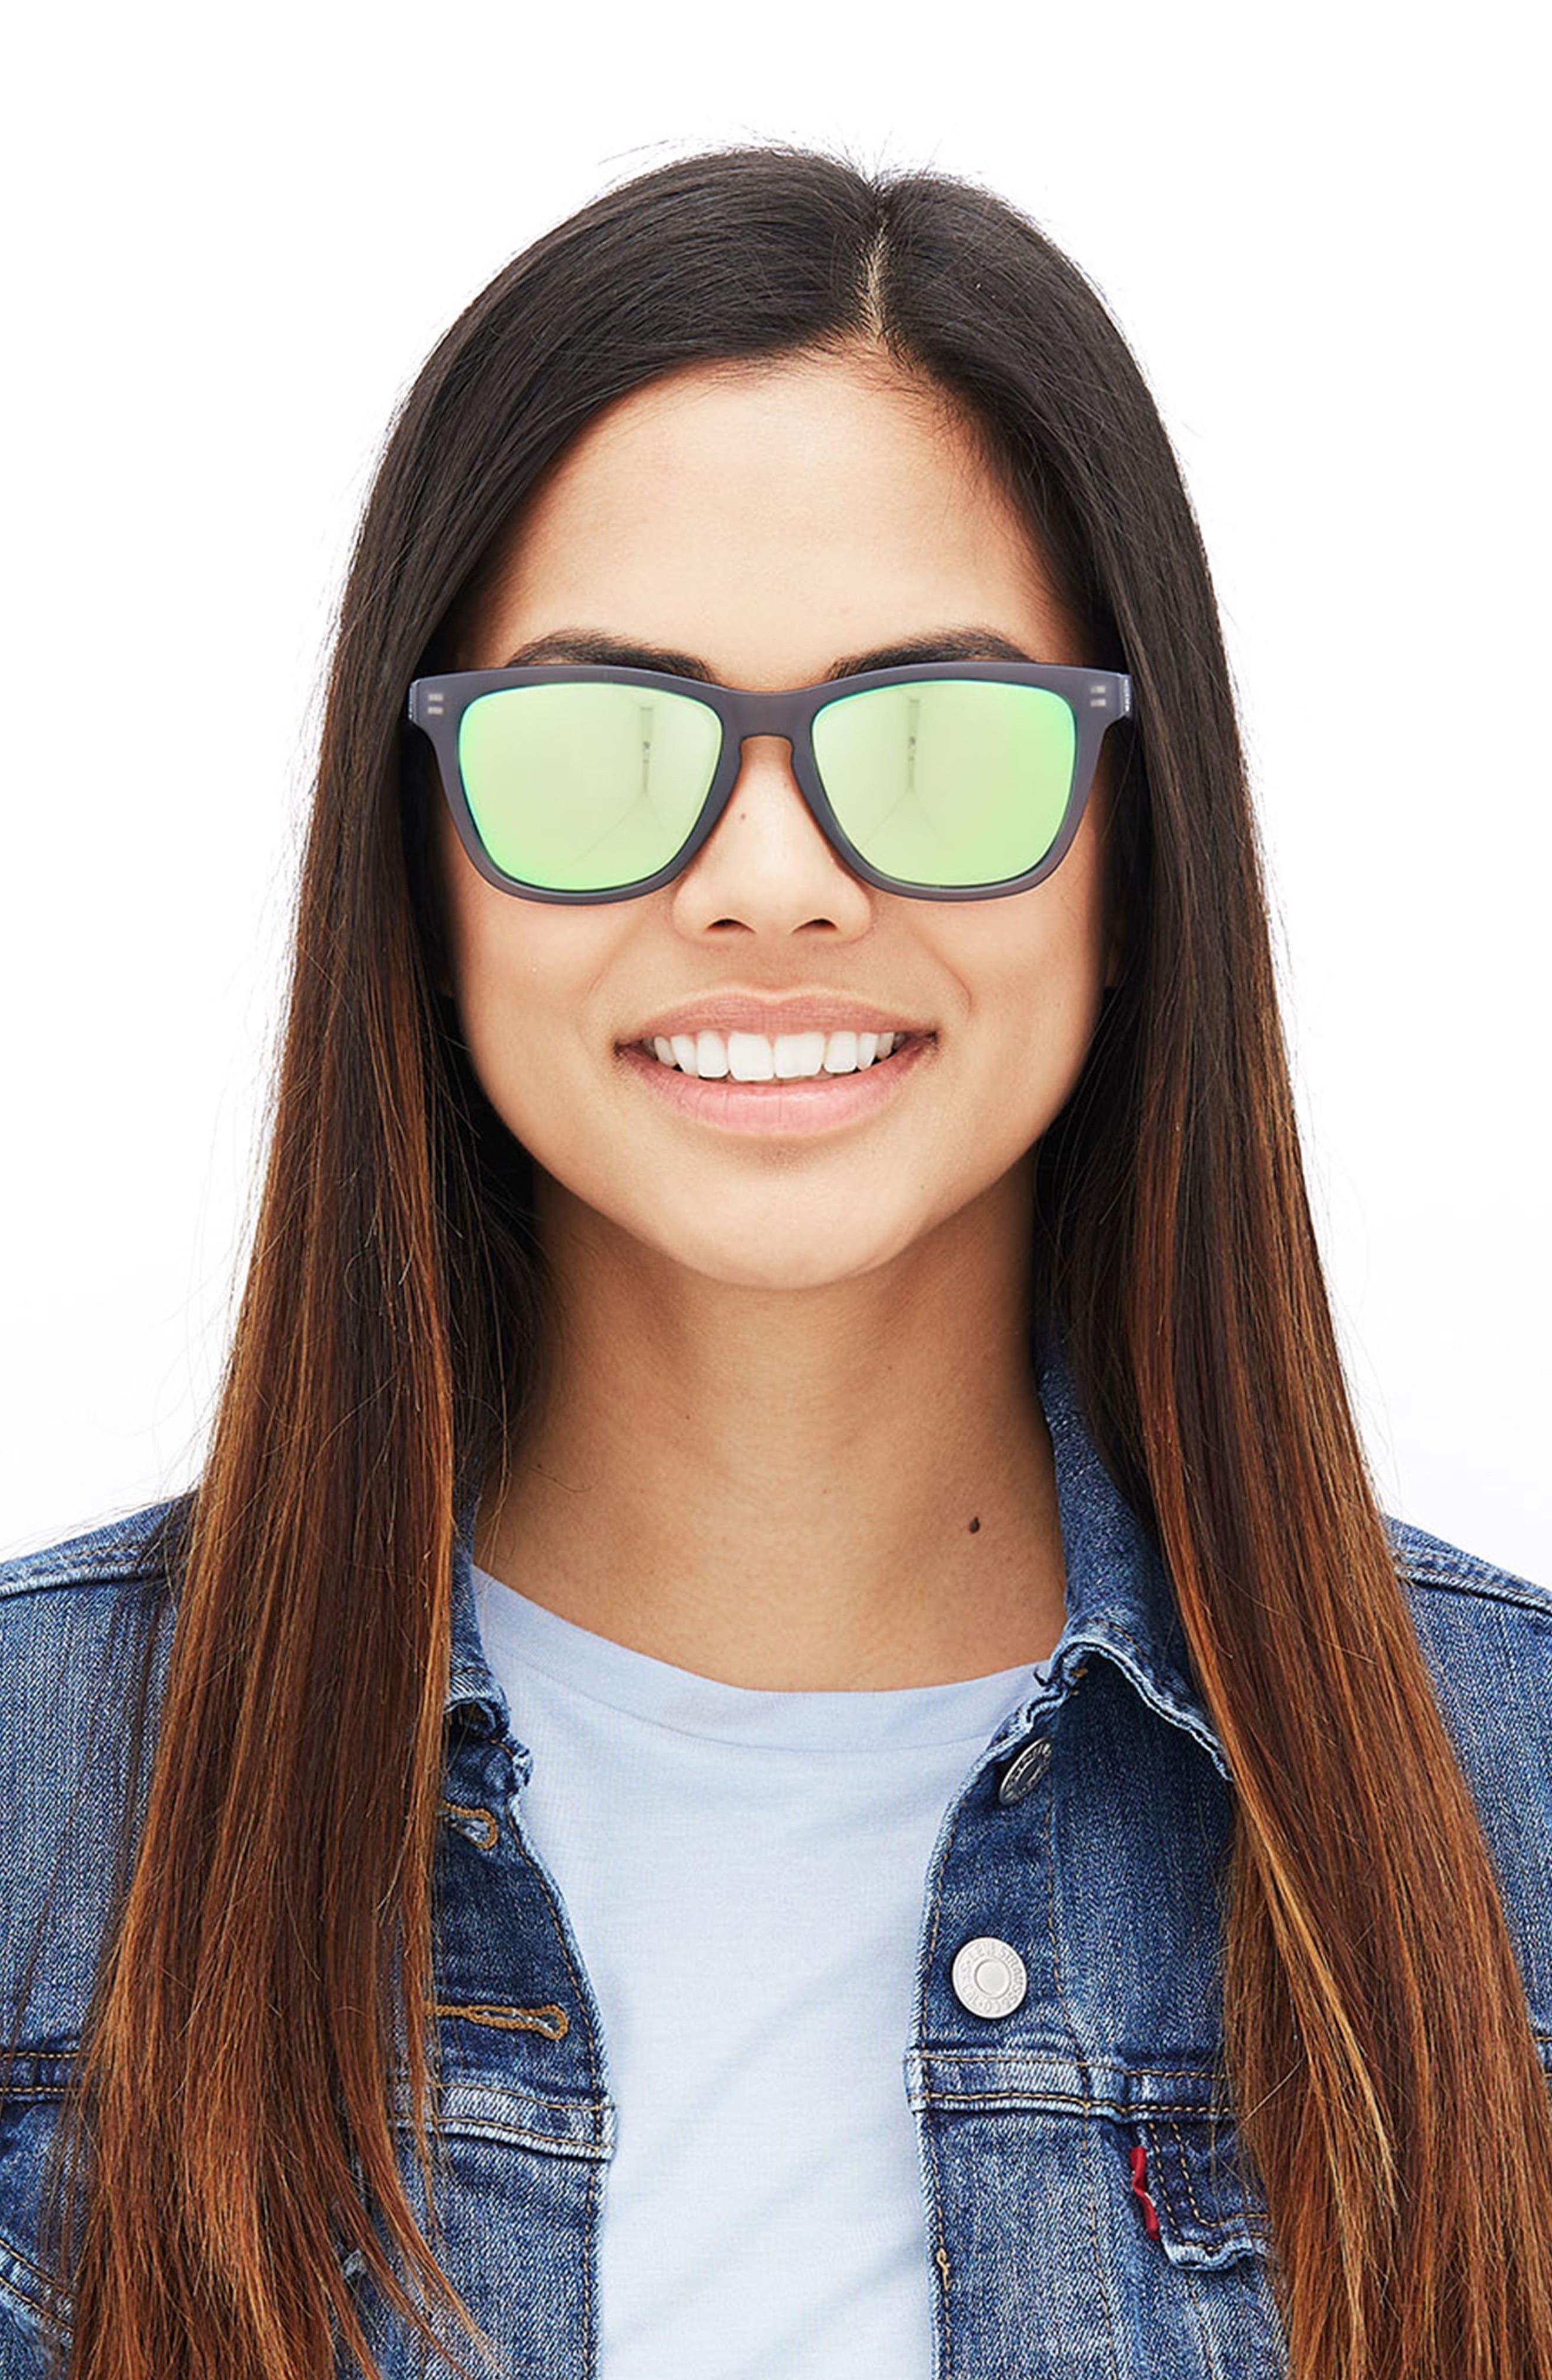 Headland 53m Polarized Sunglasses,                             Alternate thumbnail 2, color,                             Black / Lime